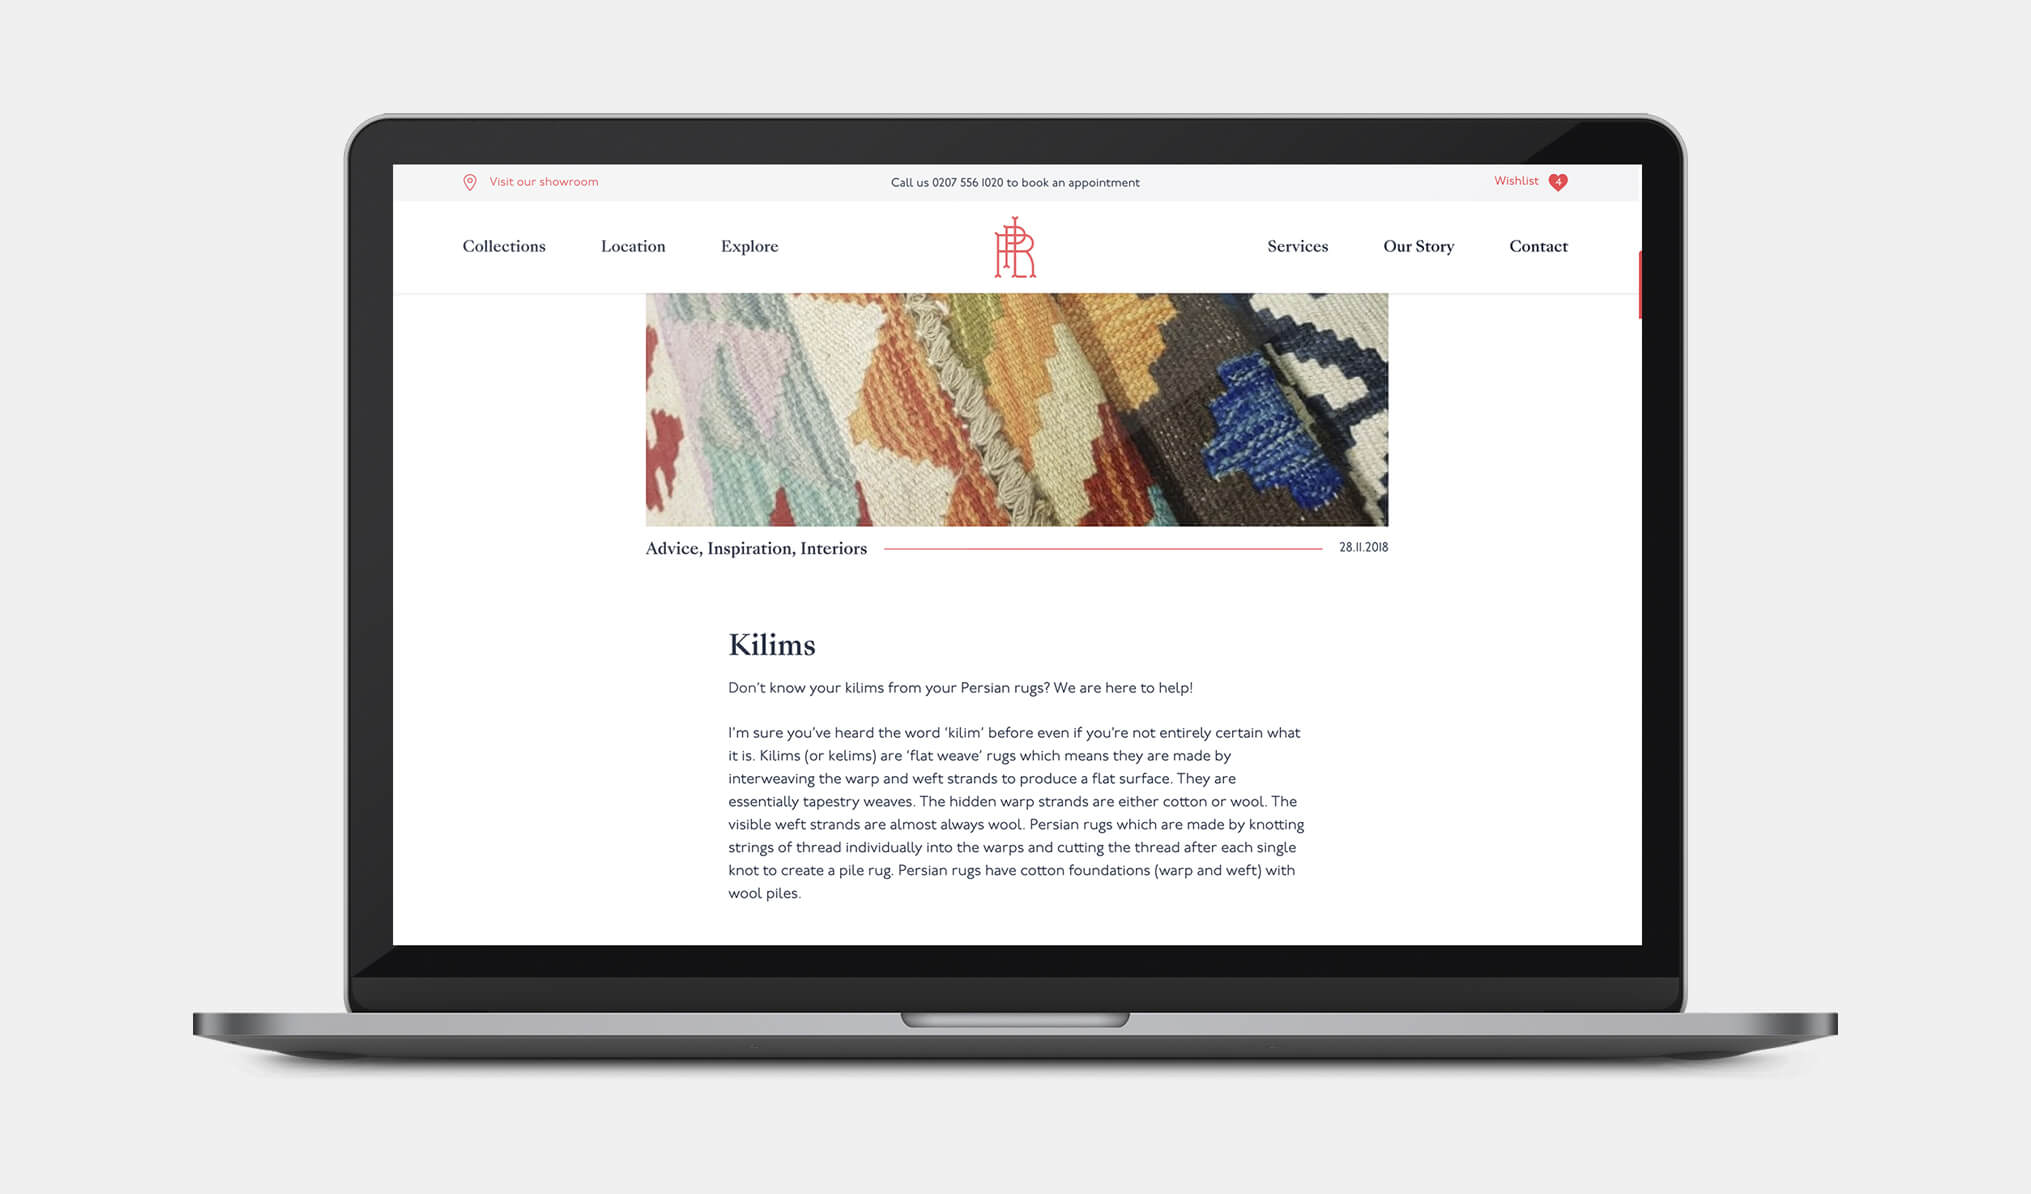 Chanelle-Sharp-Digital-Designer-Portfolio-London-Persian-Rug-Company-Desktop-5